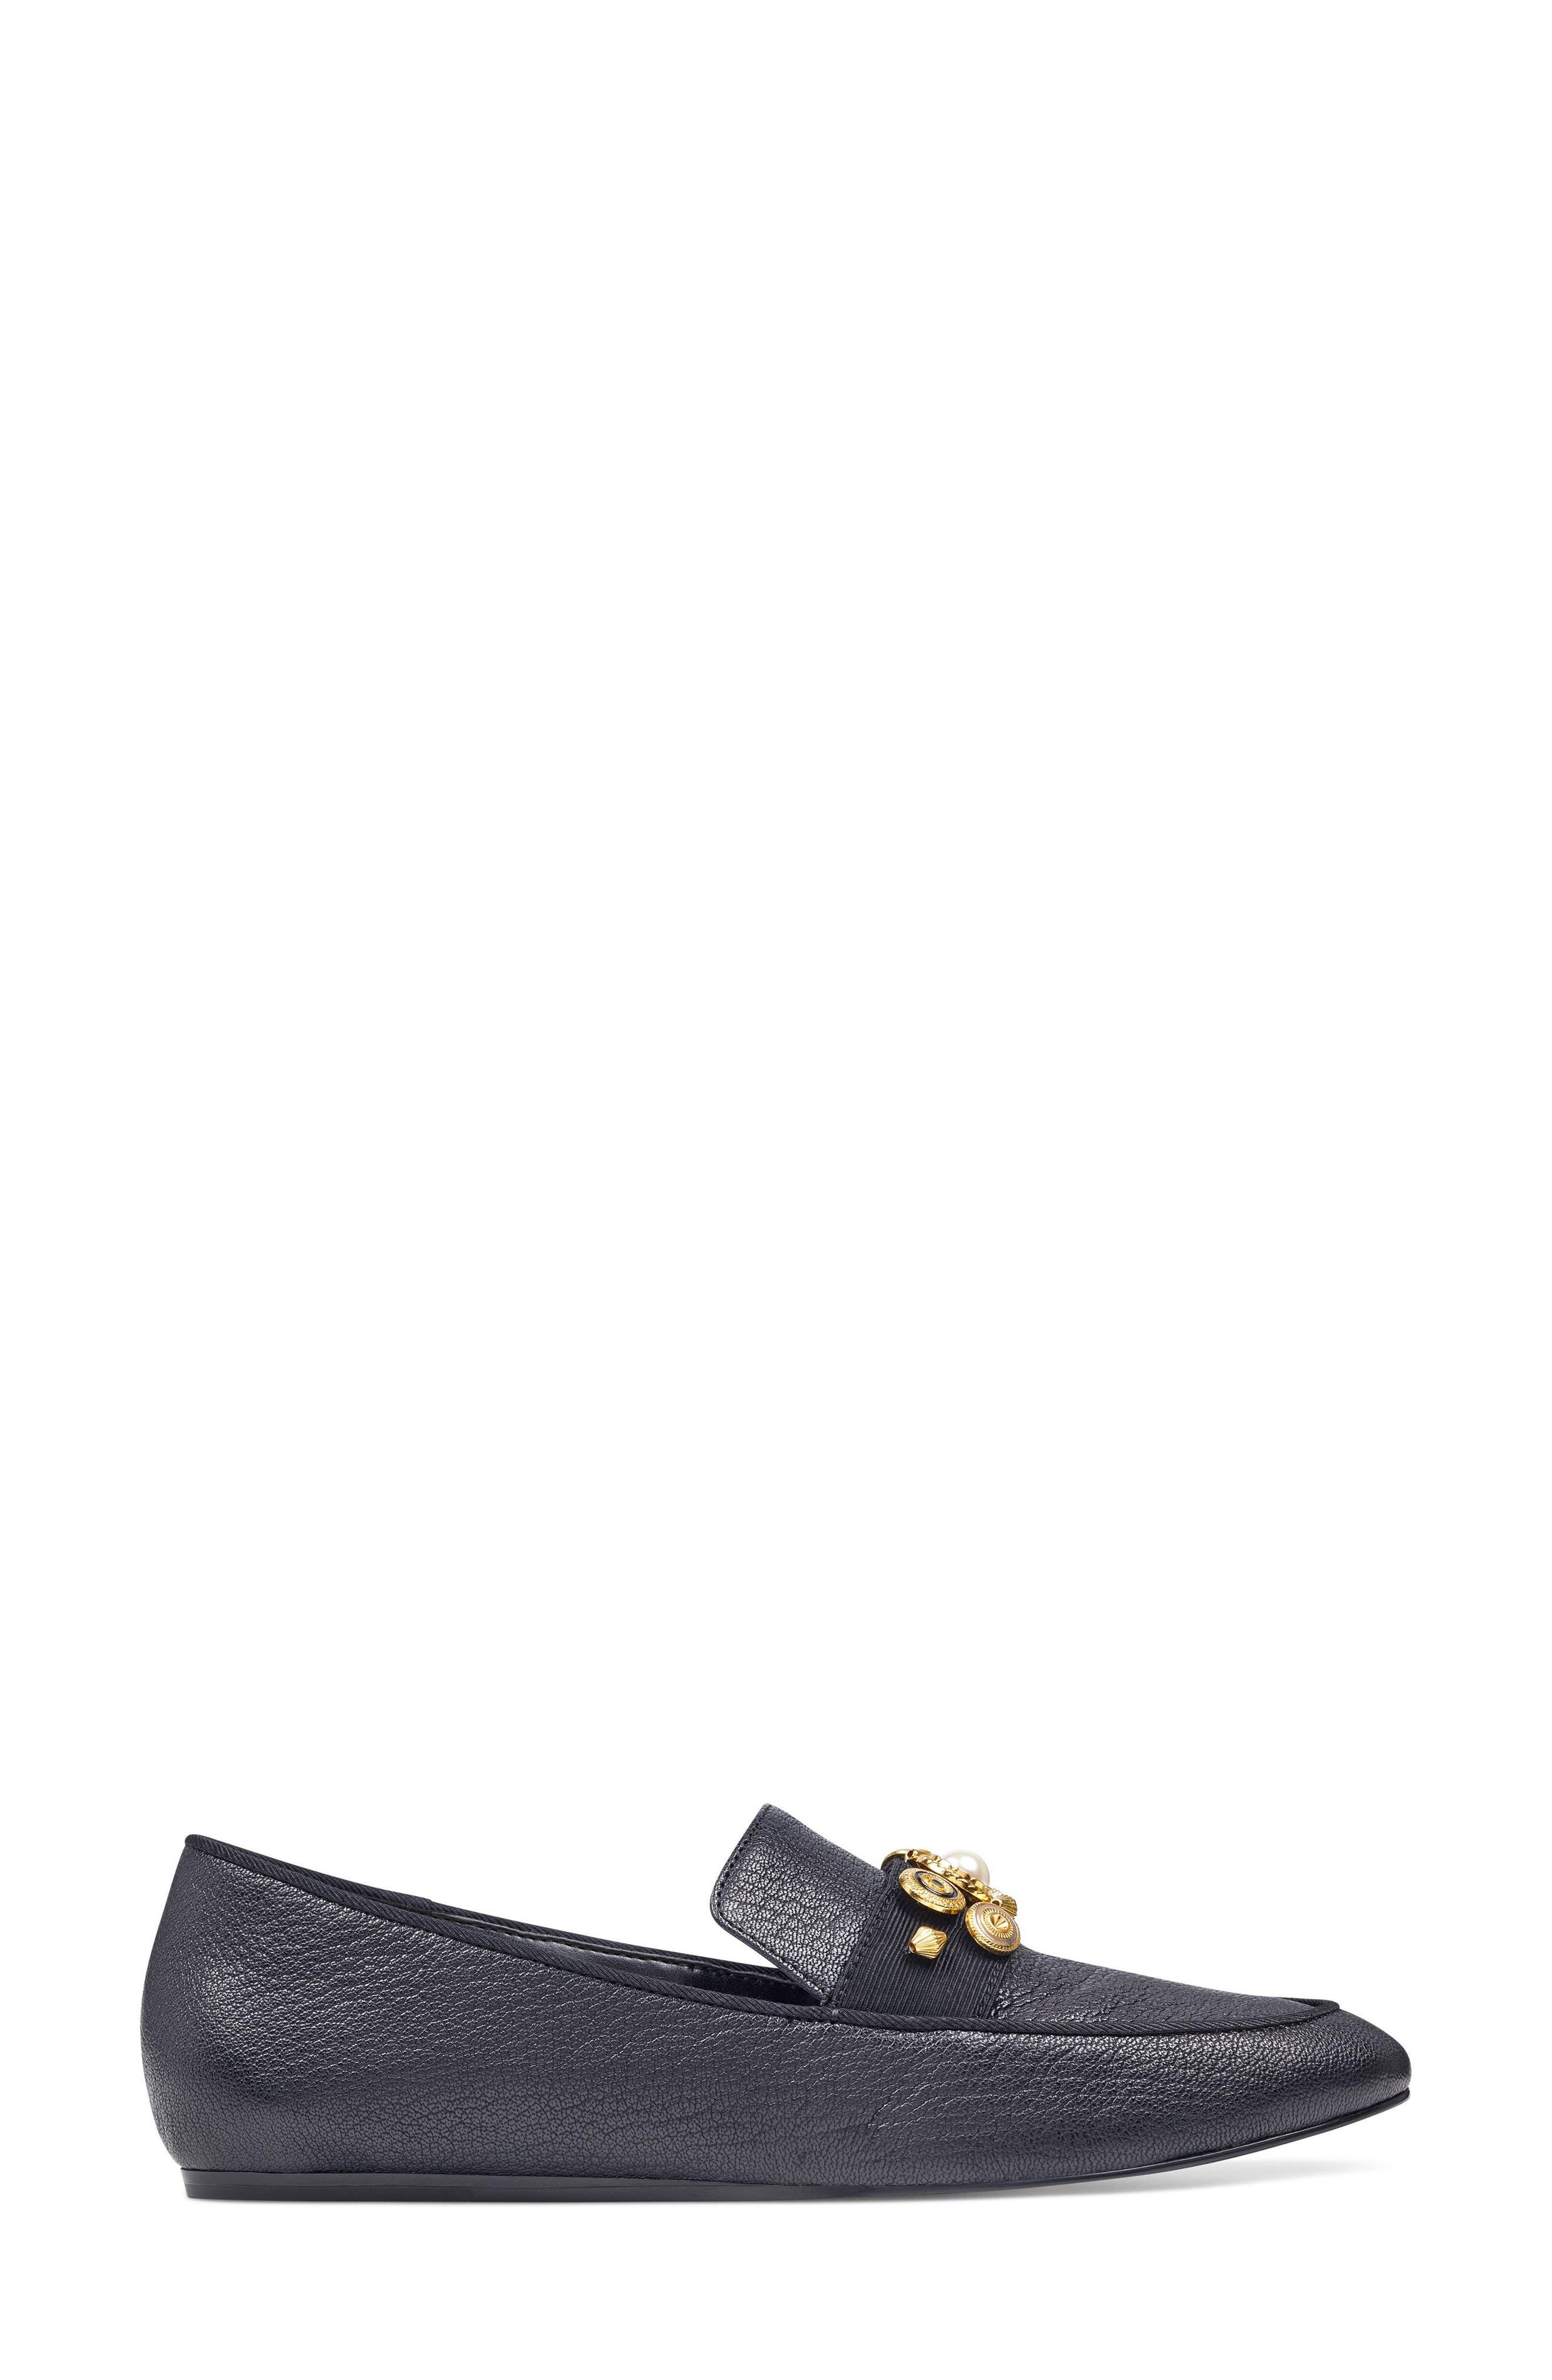 Baus Loafer Flat,                             Alternate thumbnail 3, color,                             001